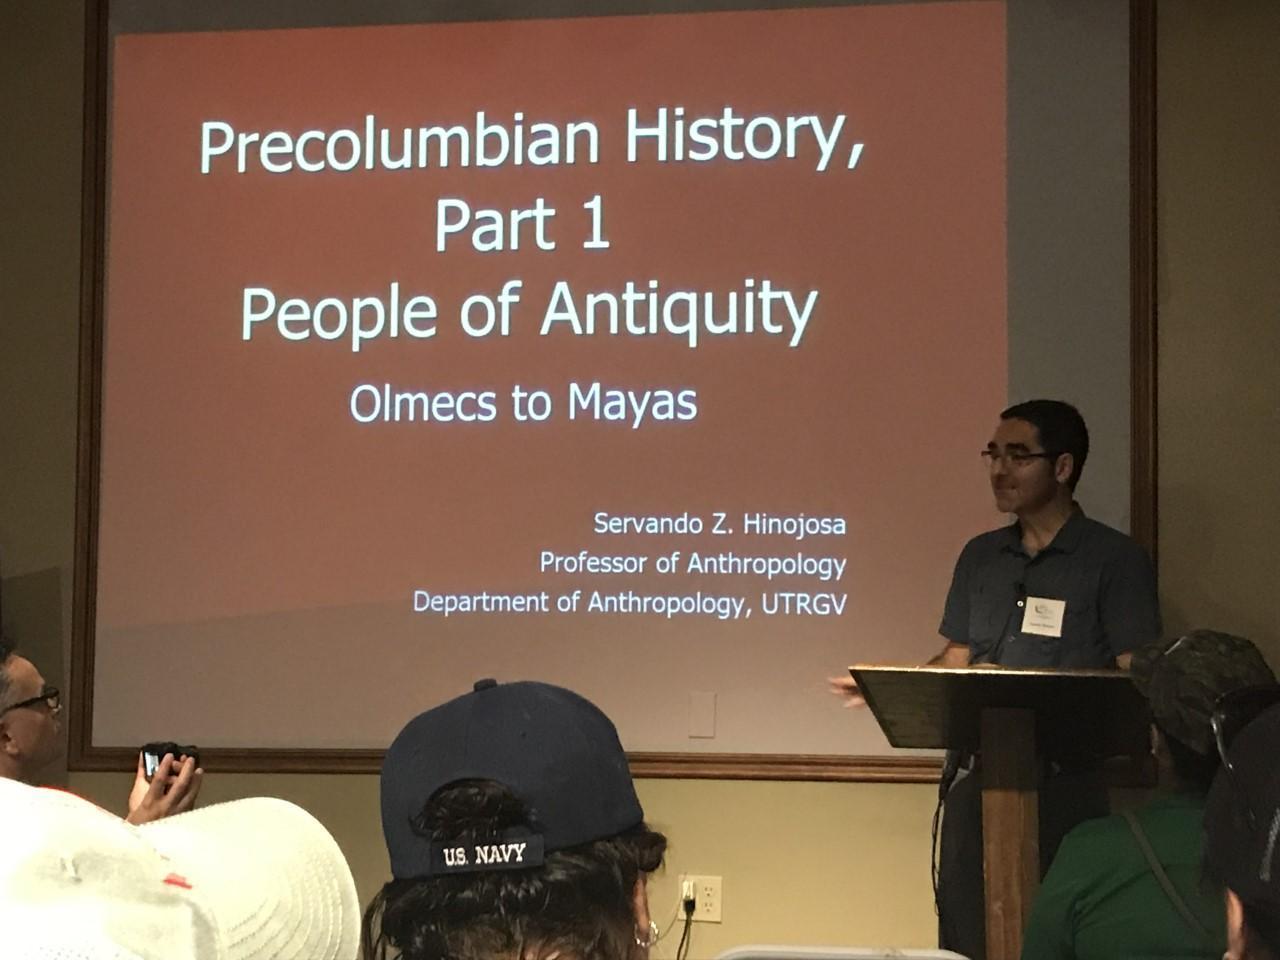 Presenter presents on Precolumbian History